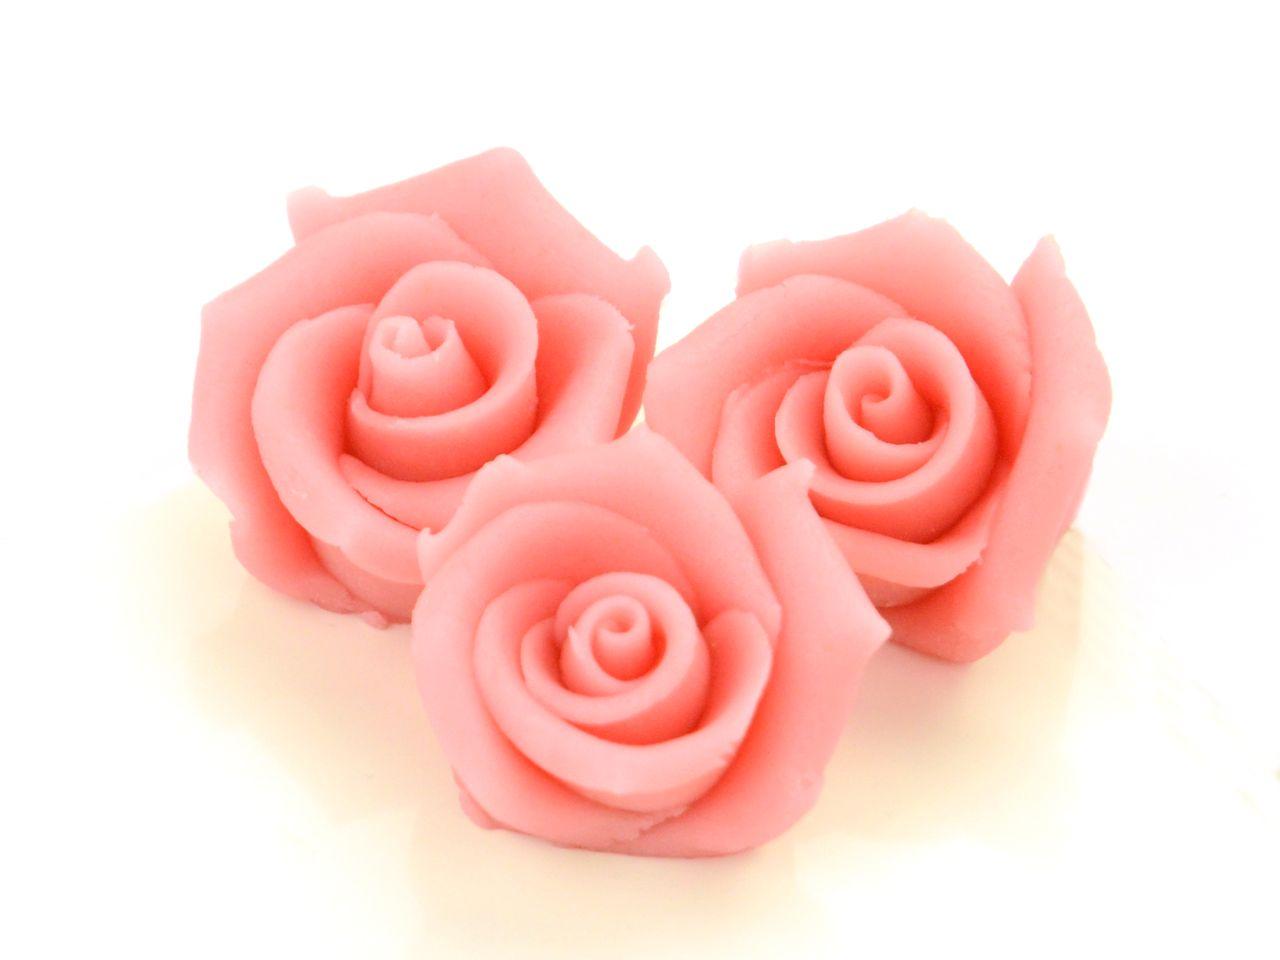 MarzipanRosen mittel rosa 4 Stck  Rosen Marzipan